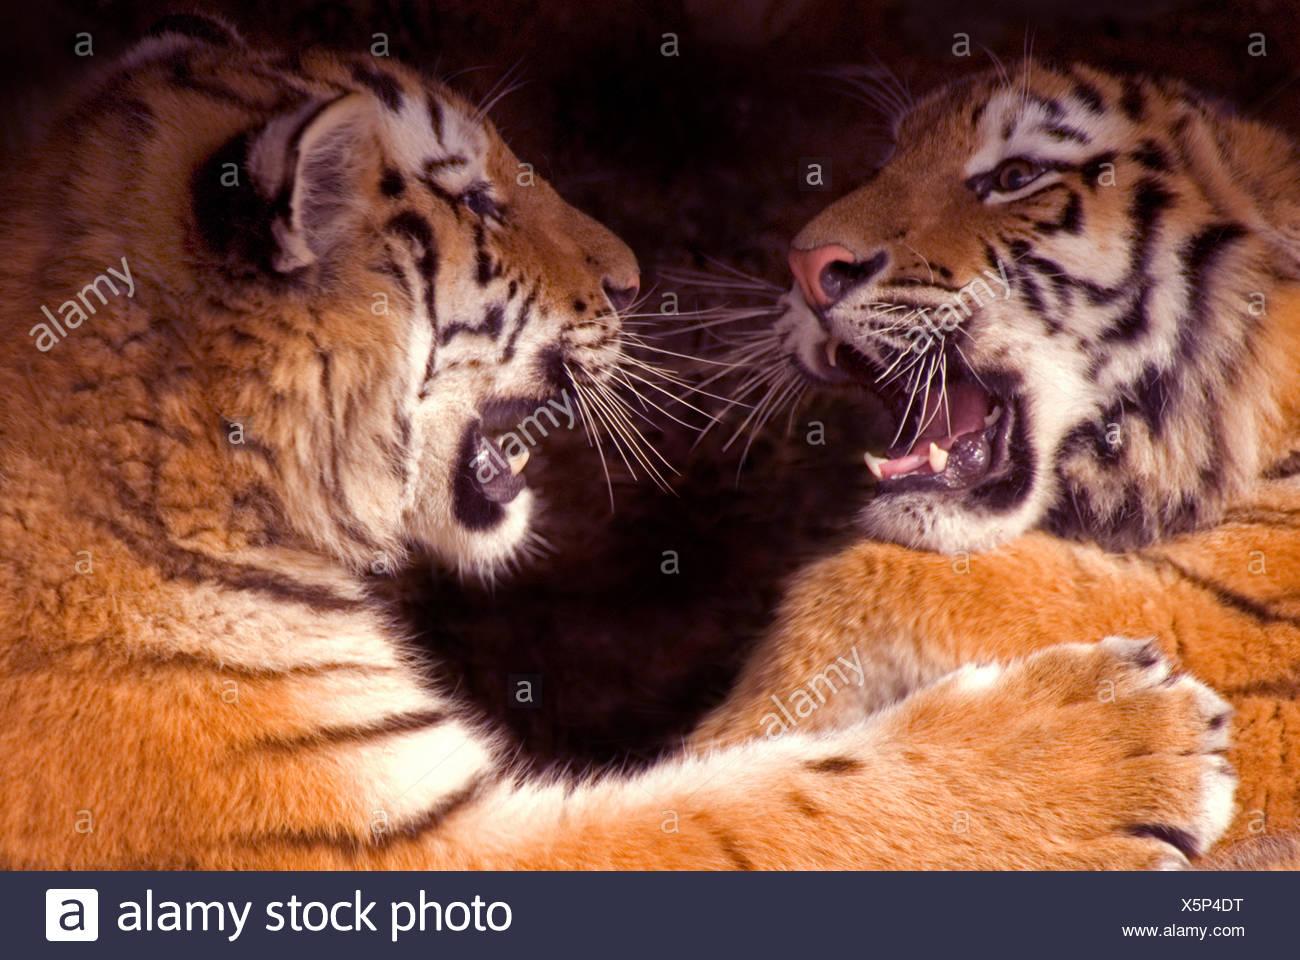 Siberian tiger {Panthera tigris altaica} two cubs play fighting, captive - Stock Image